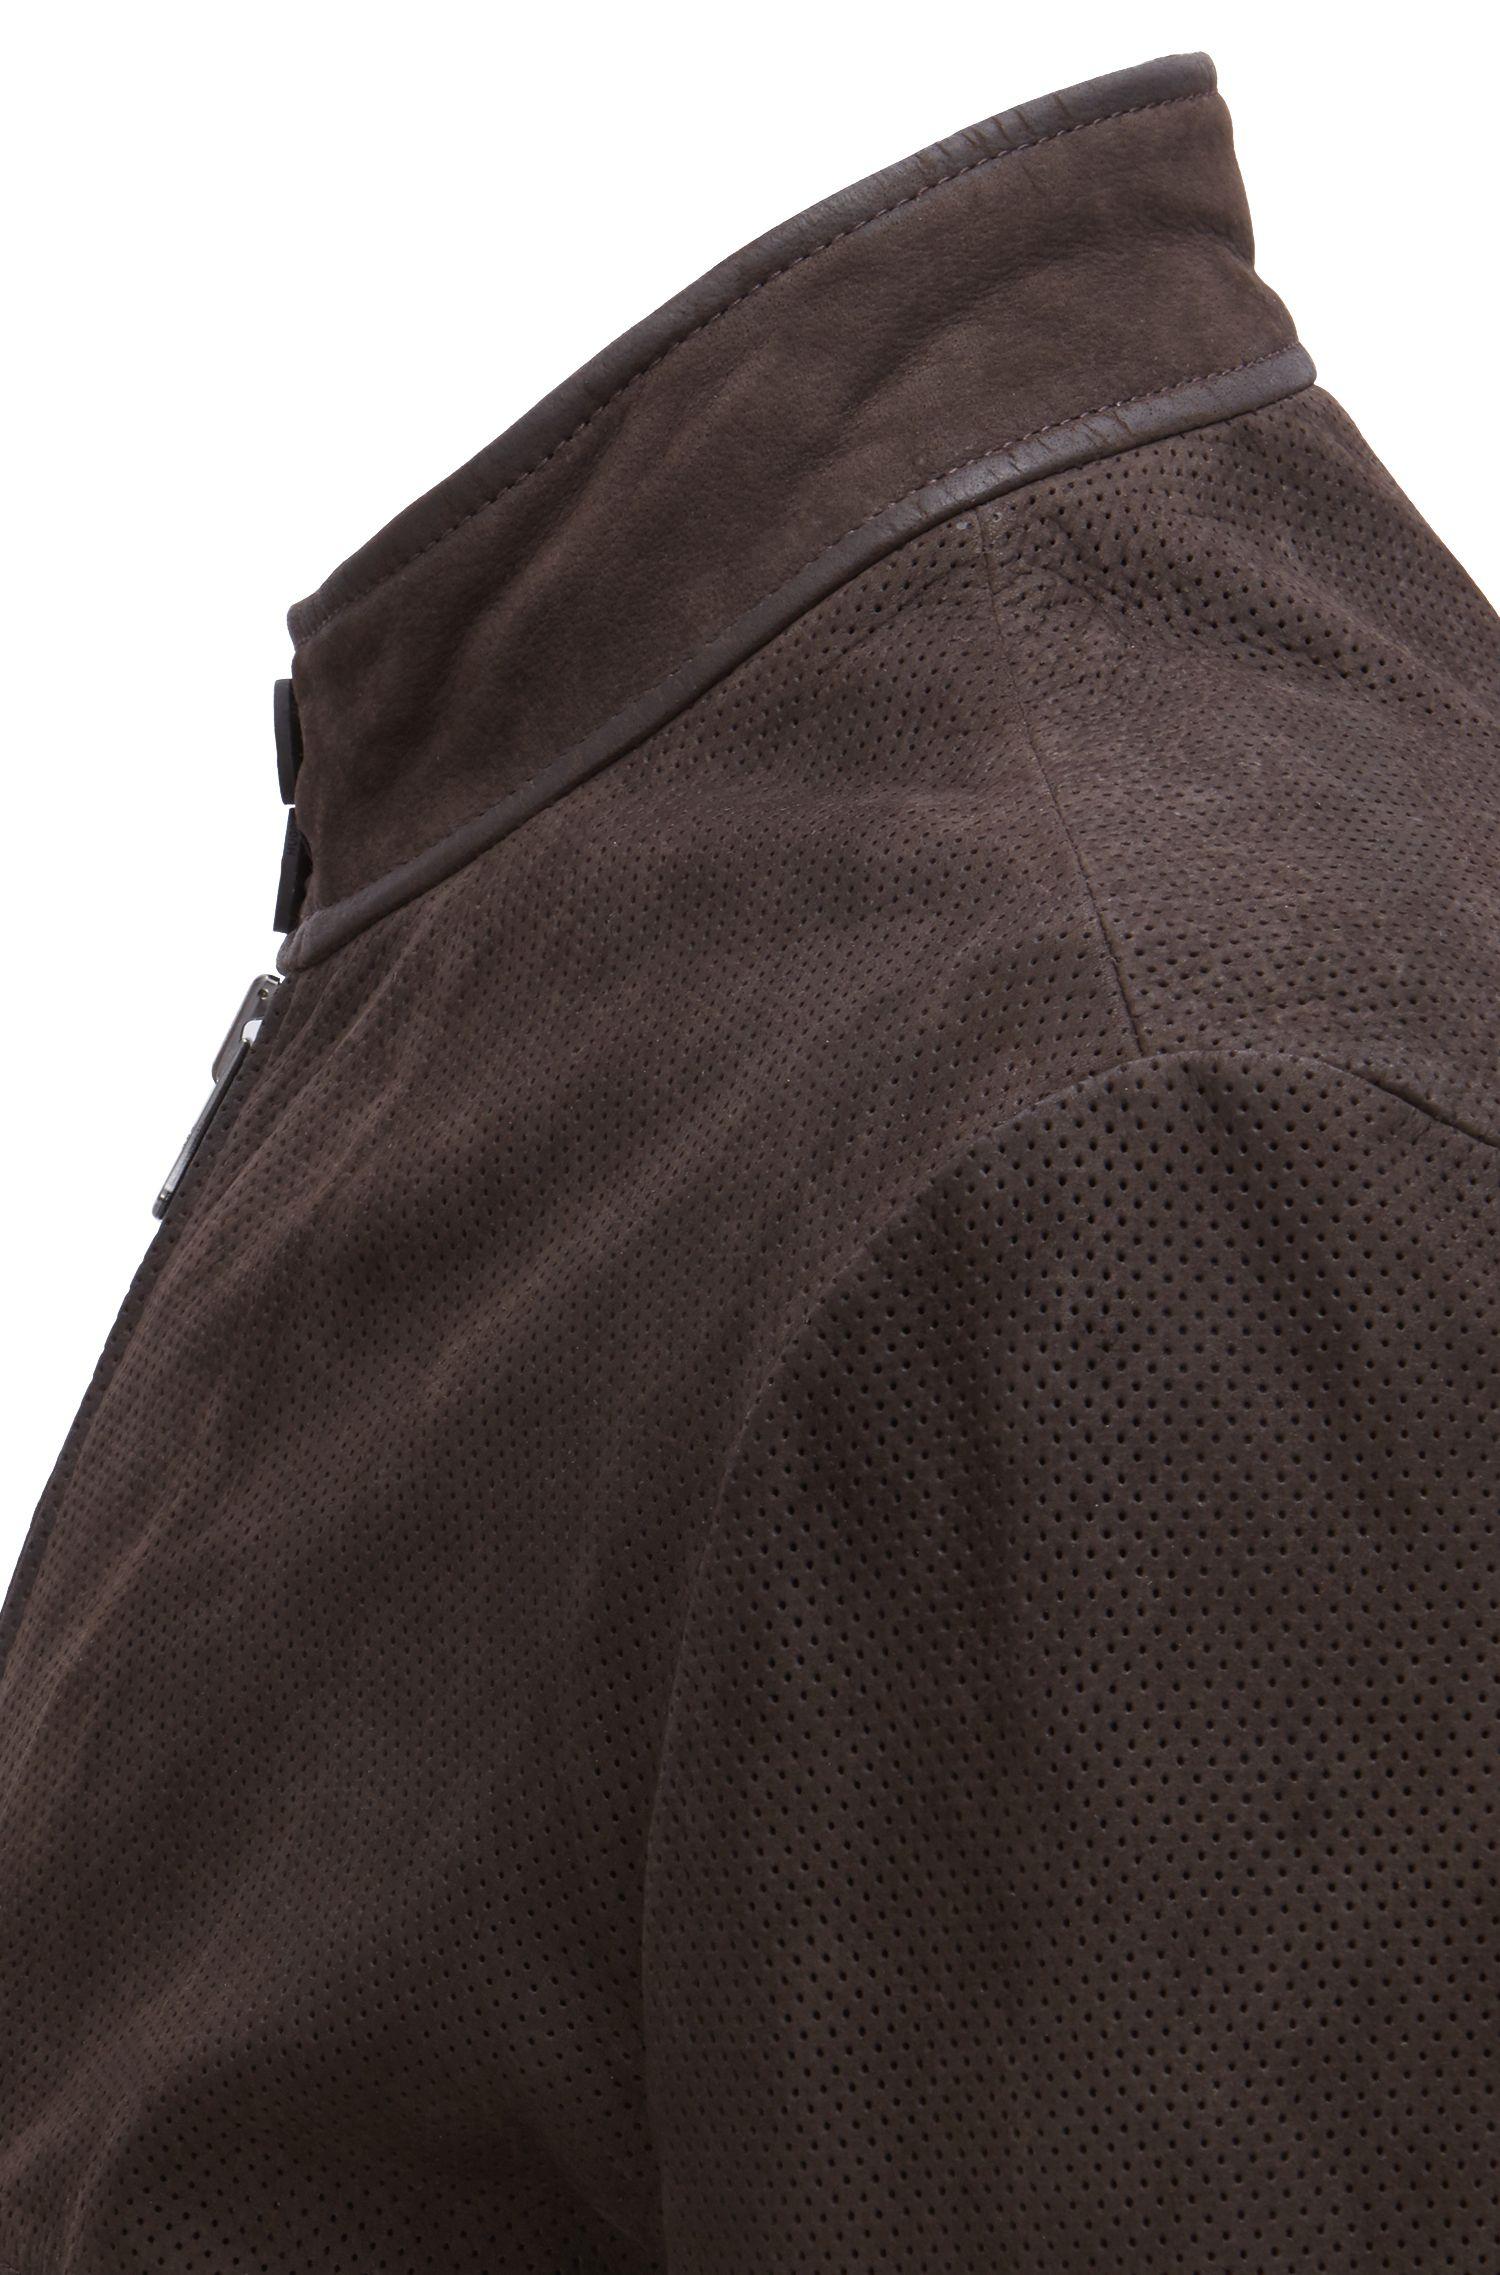 Biker jacket in buffalo nubuck with perforated details, Dark Brown